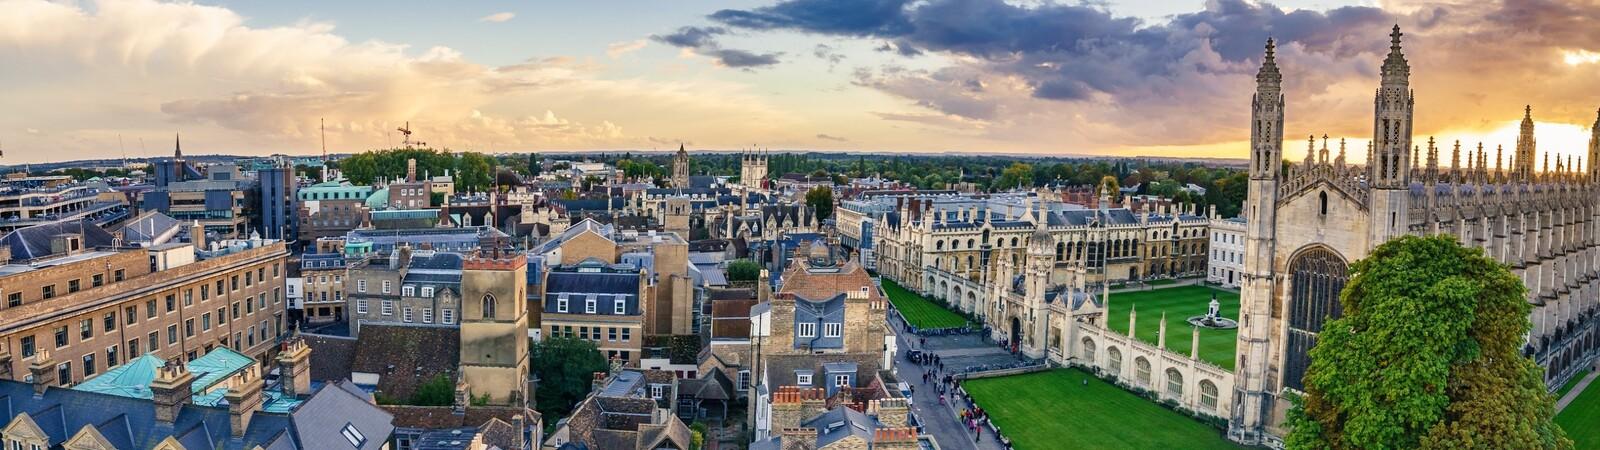 An aerial shot of Cambridge